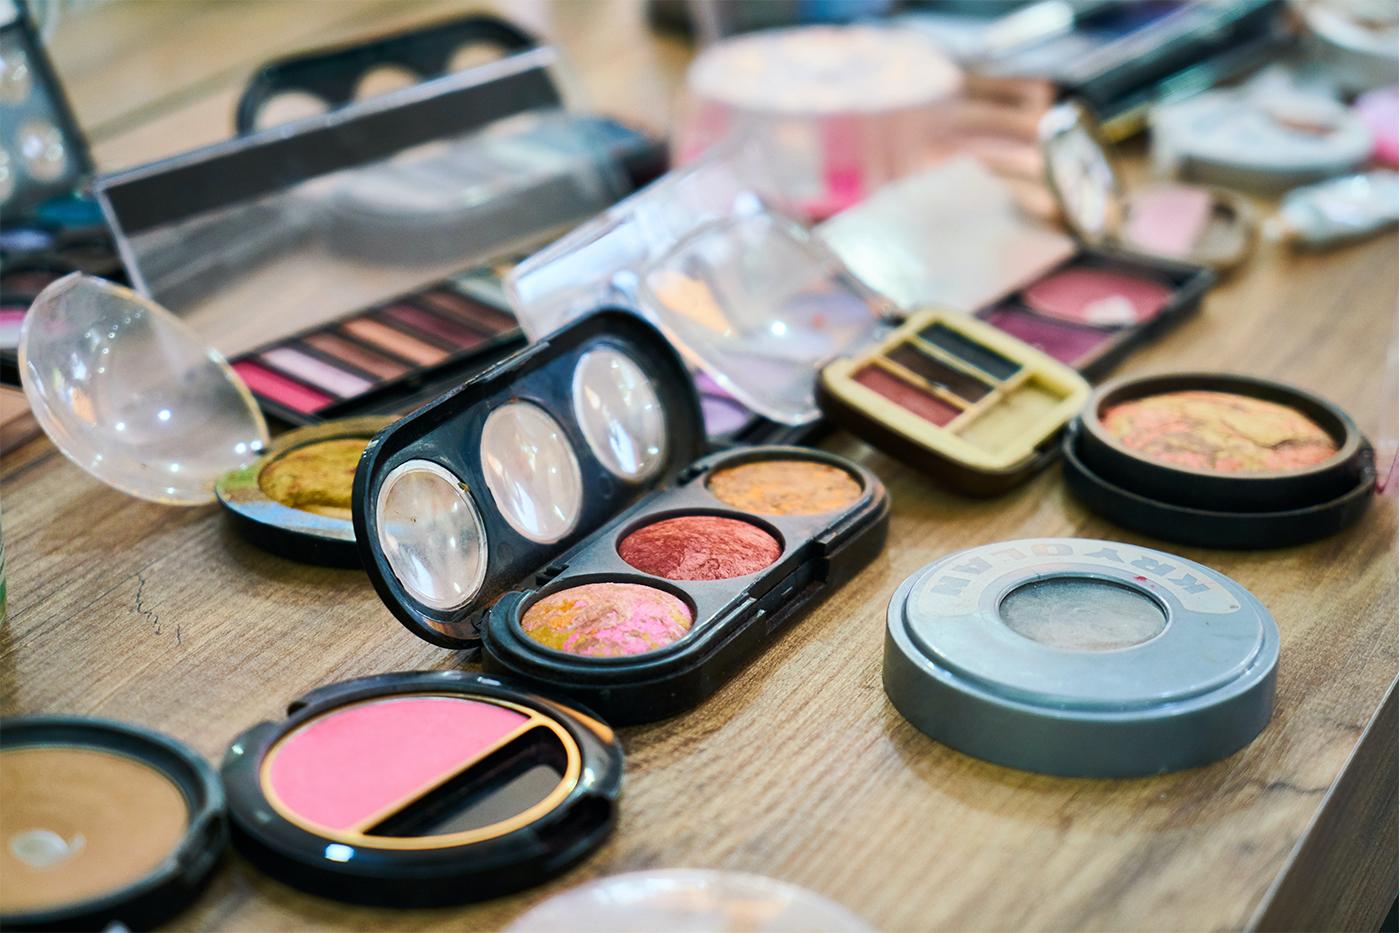 Digital beauty brands attract investor attention